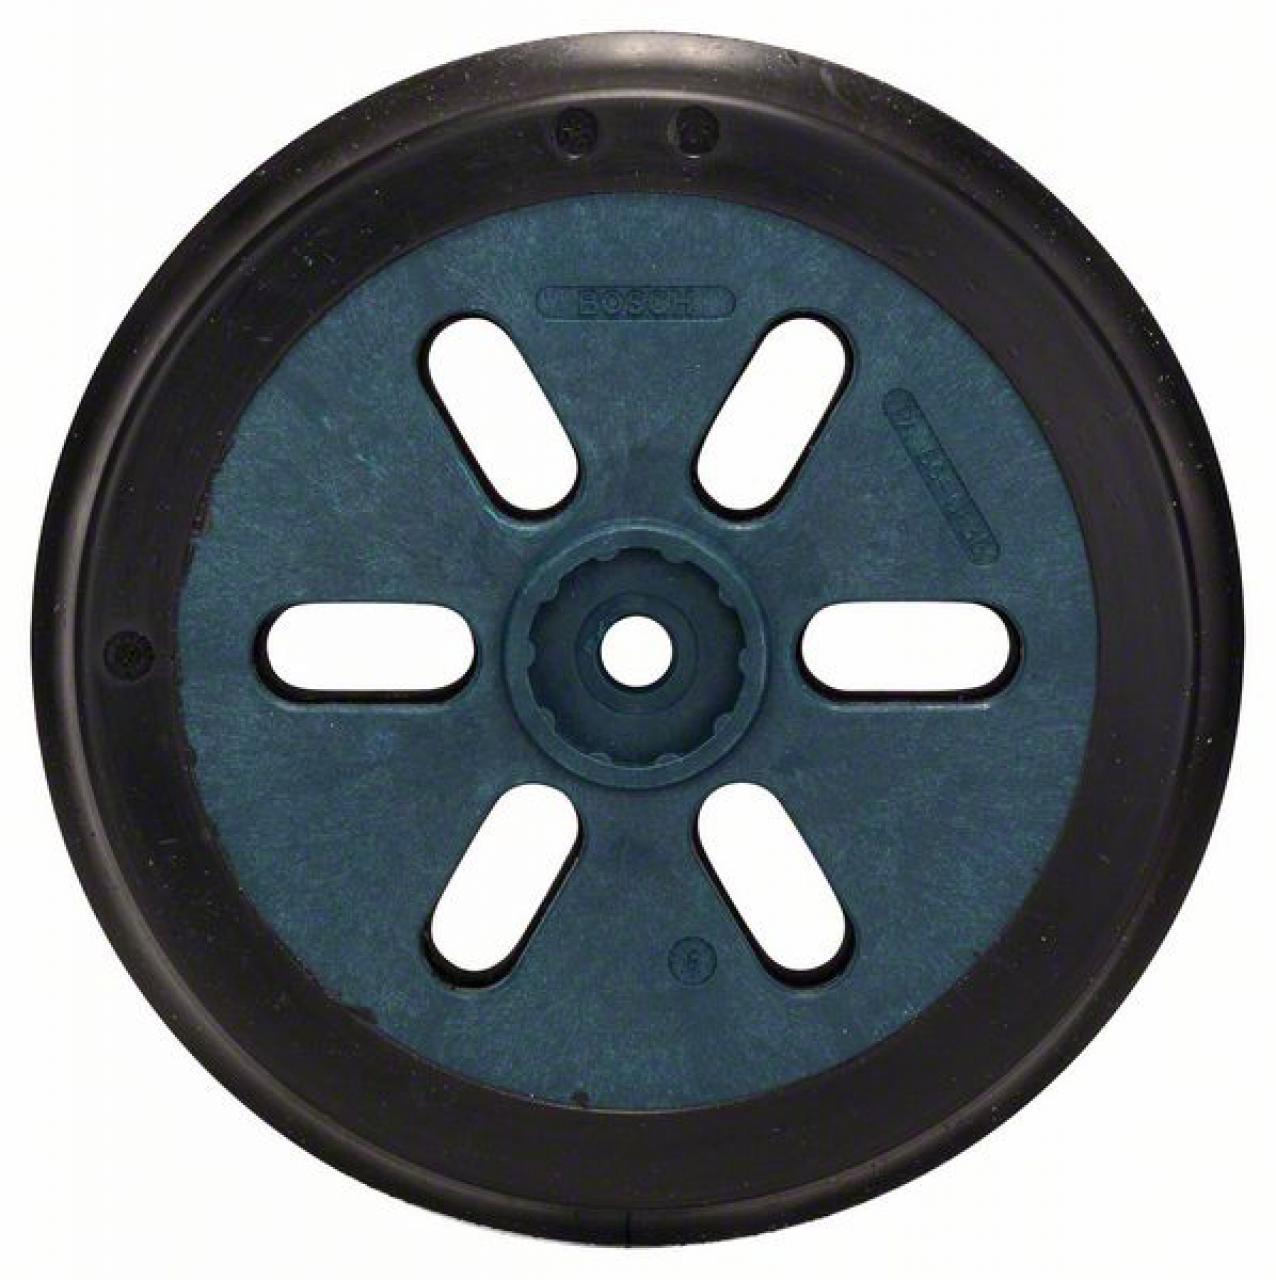 Bosch Polierfilz für Exzenterschleifer Klett hart 2er-Pack 160 mm